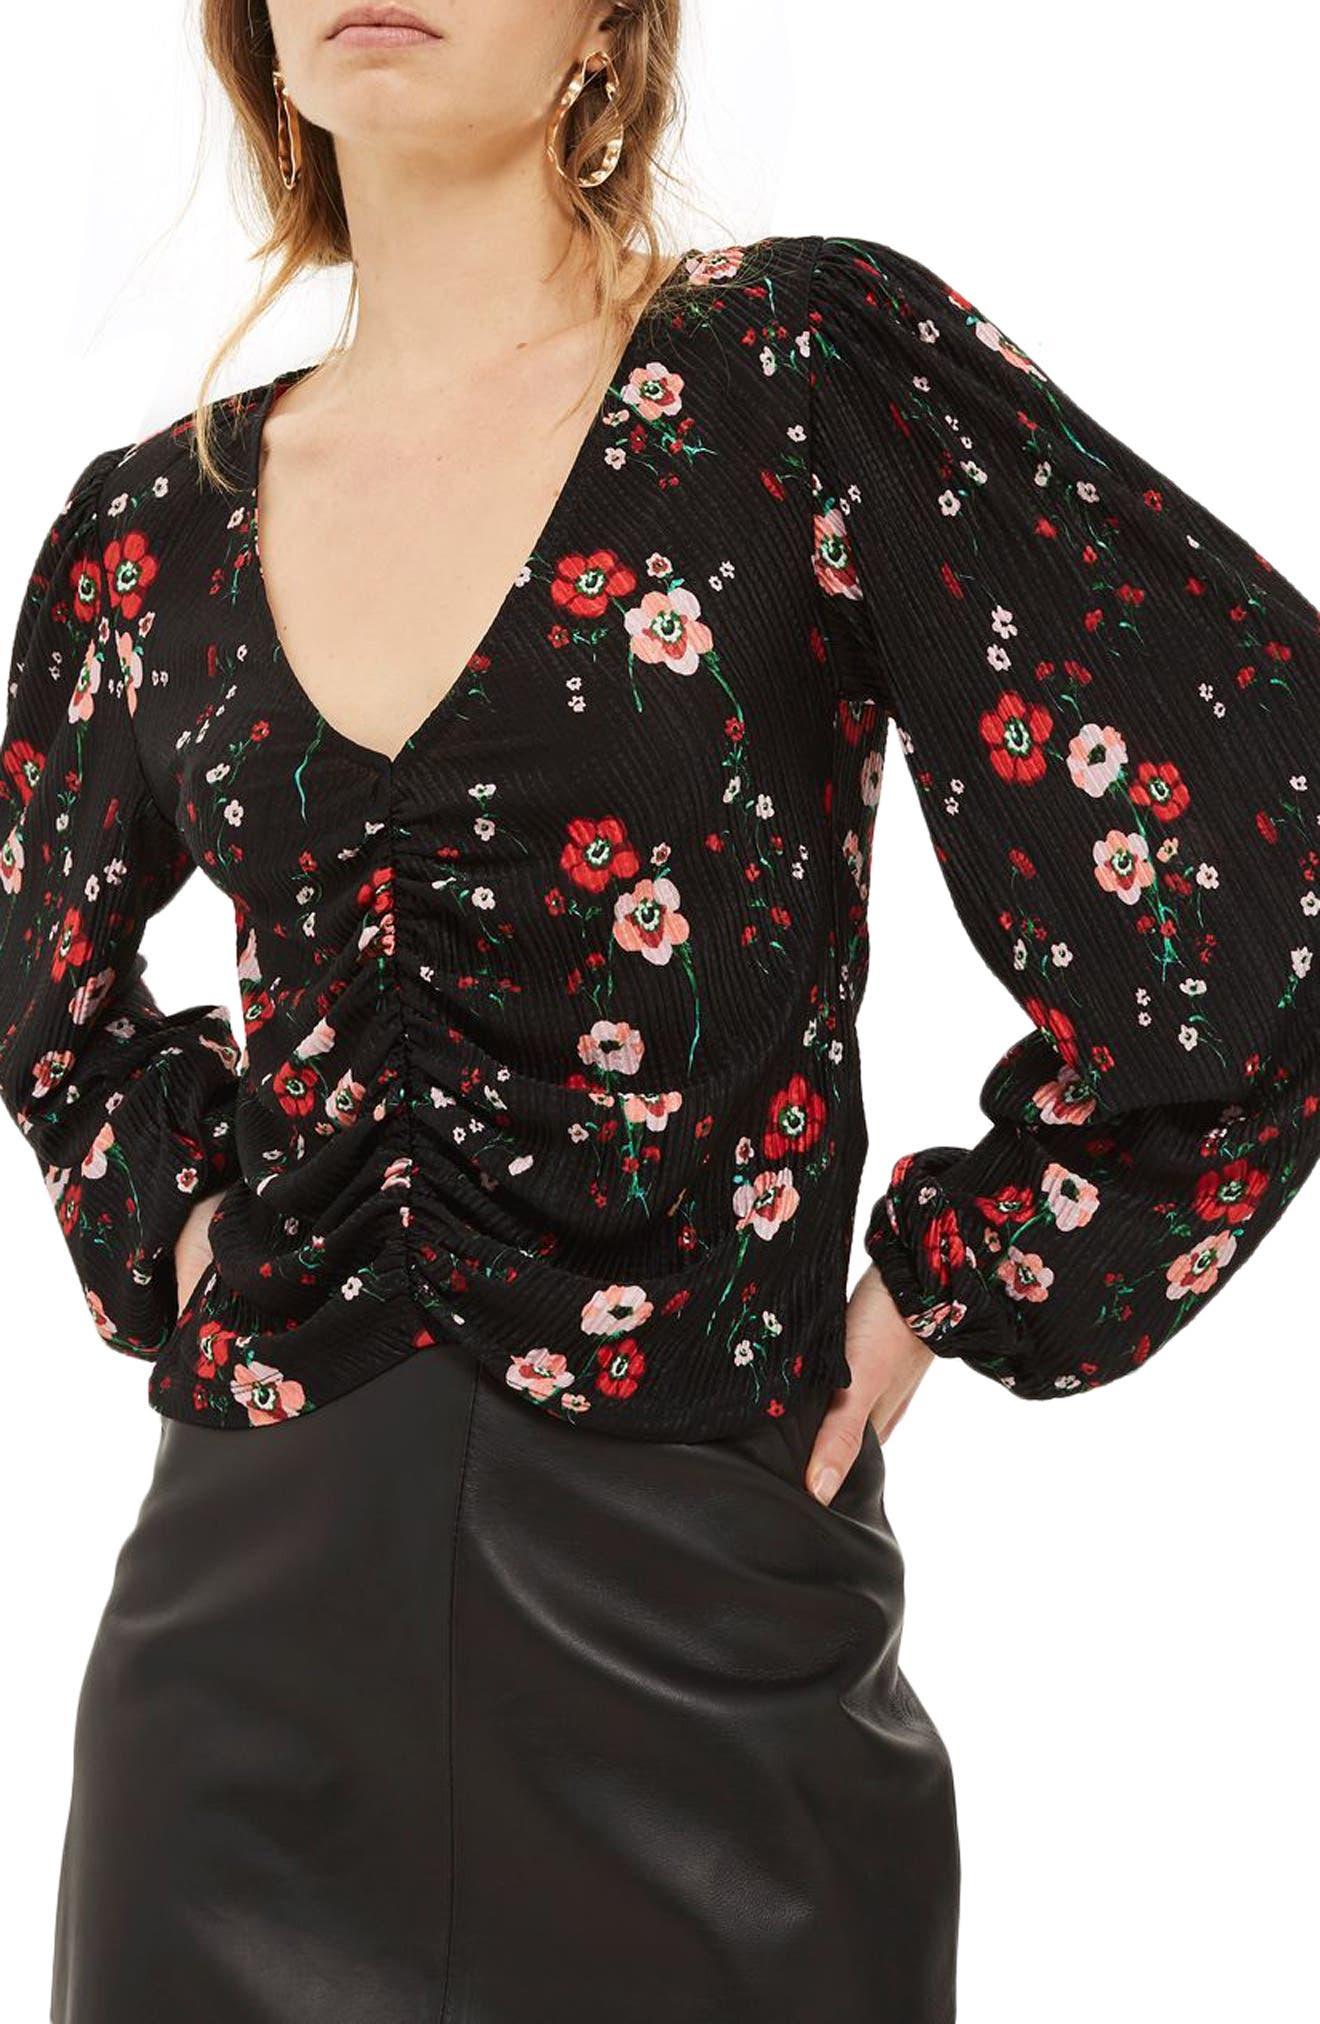 Main Image - Topshop Floral Bloom Blouson Top (Petite)